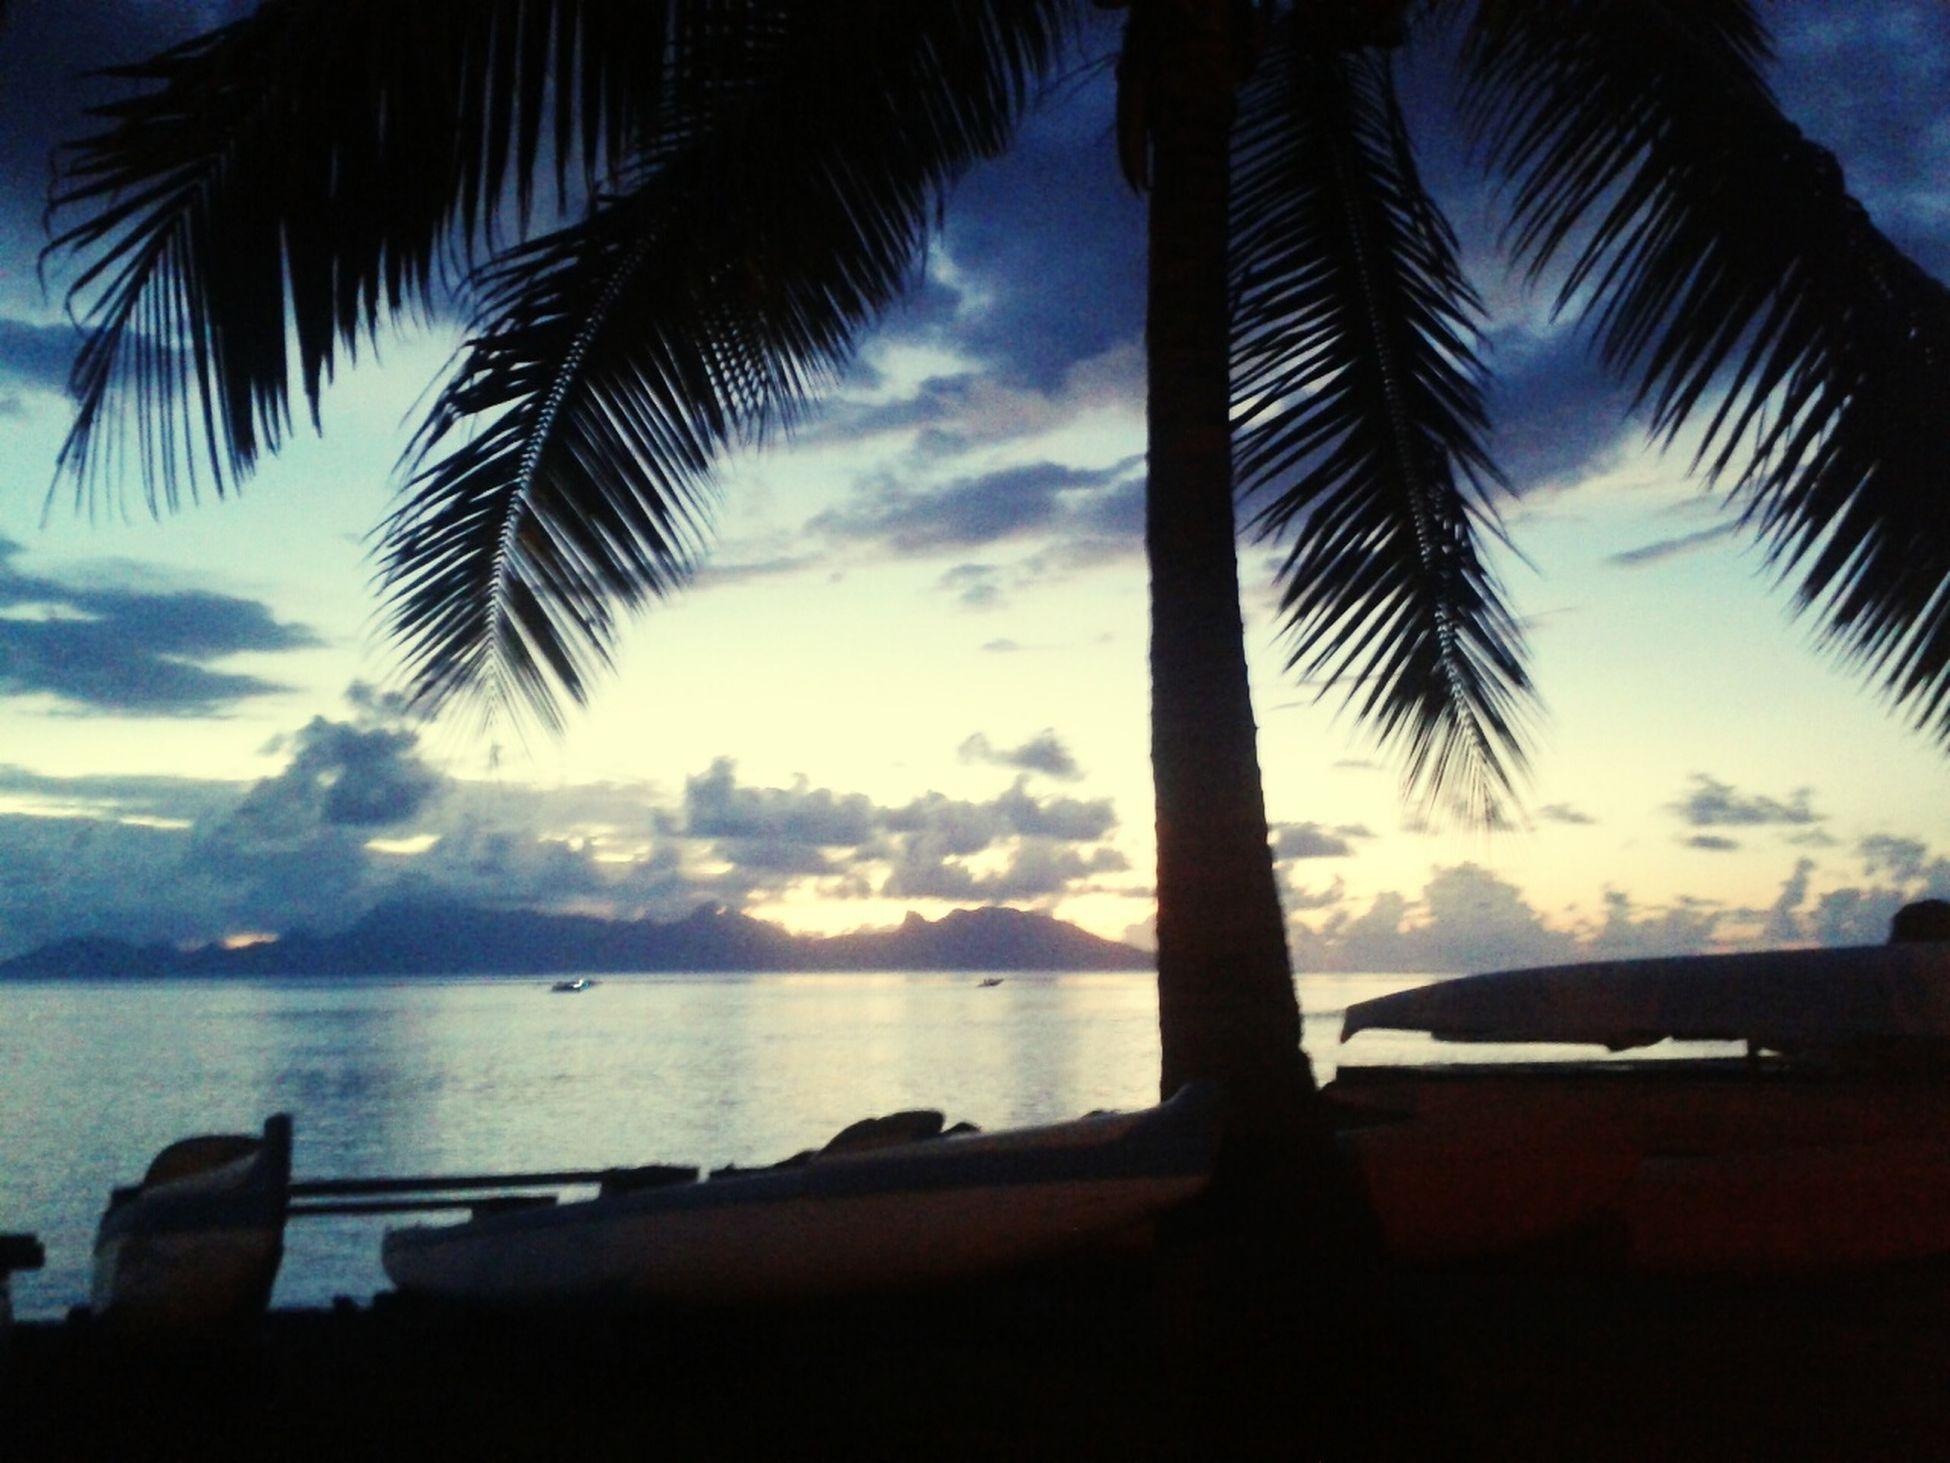 Un nouveau jour qui s'achève .. SunsetTaapuna life's better in Tahiti